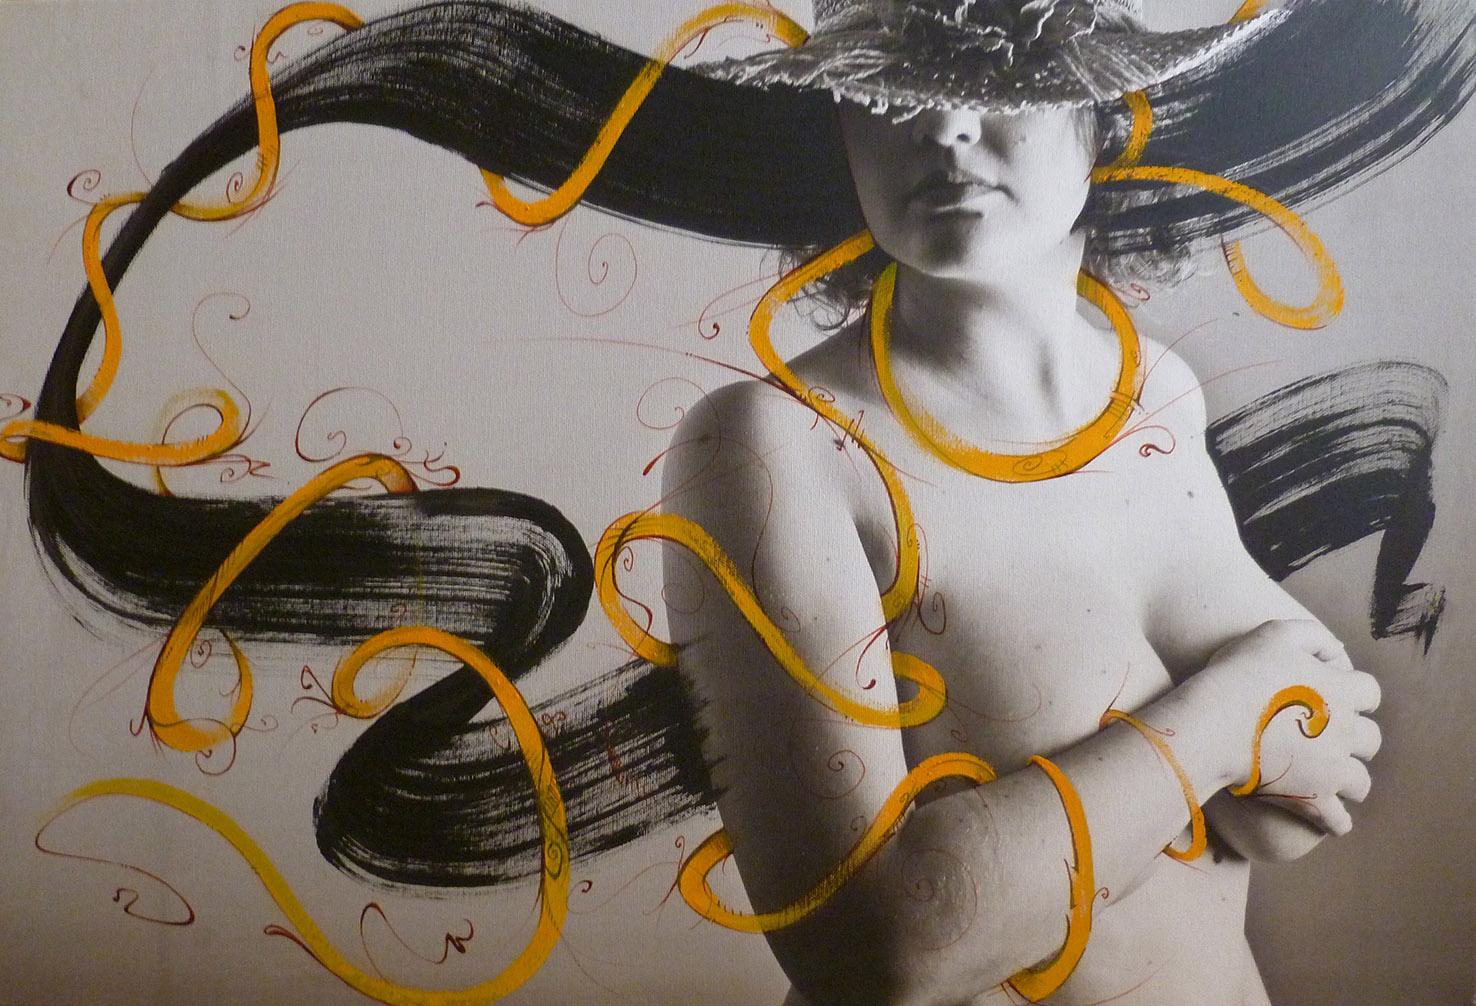 abys - da lyon -streetart illustration erotic art spacejunk venus sein femme